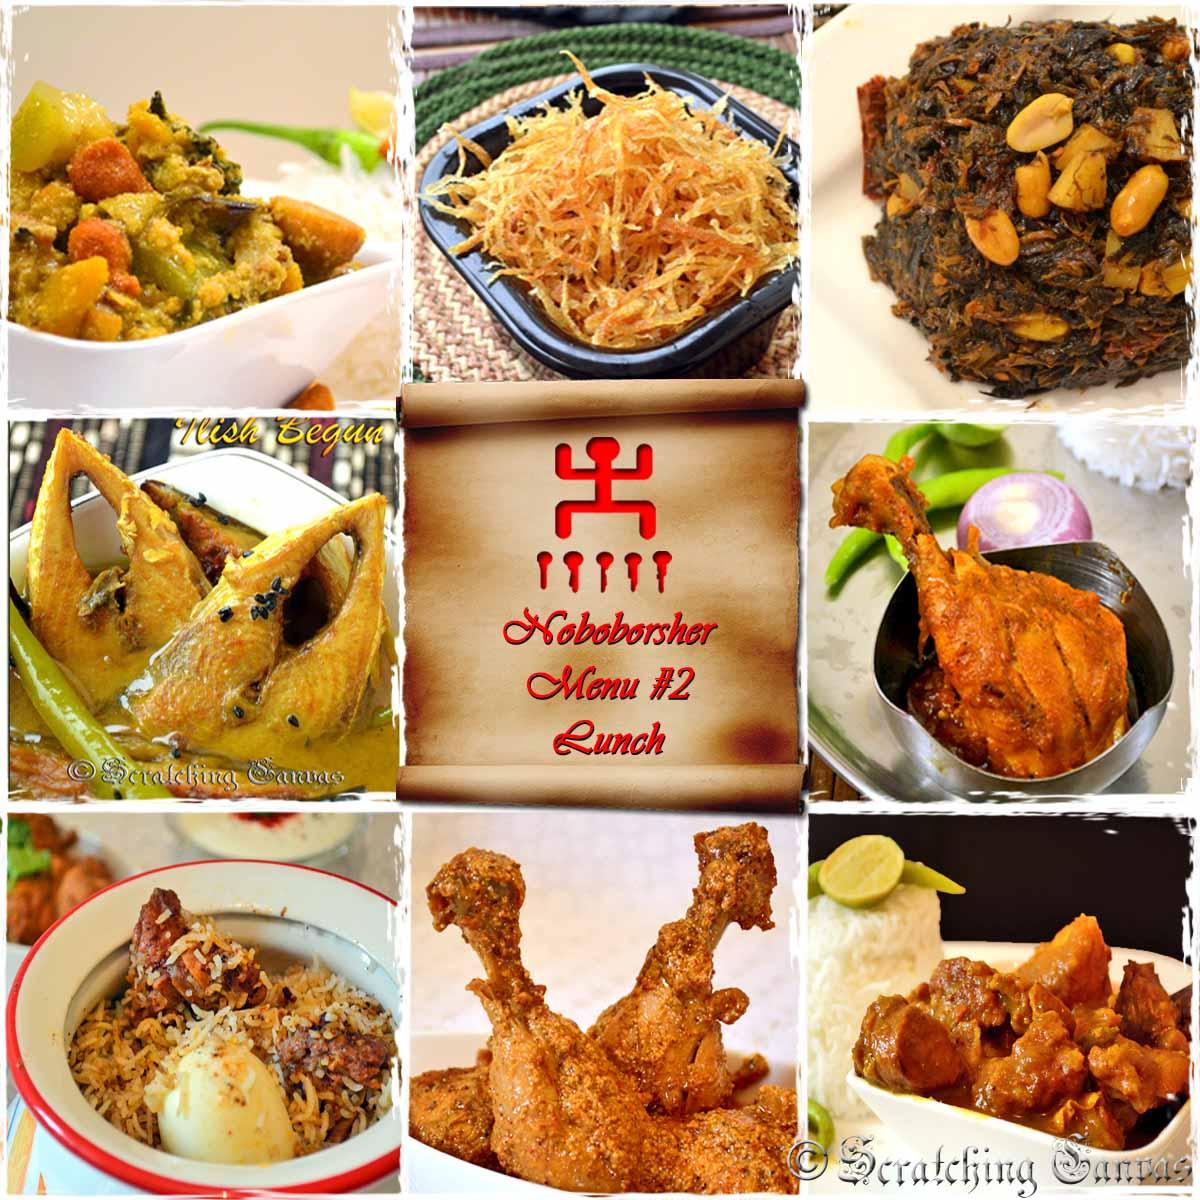 Poila baisakh nobo borsho bengali new year special menu roundup traditional bengali lunch forumfinder Choice Image